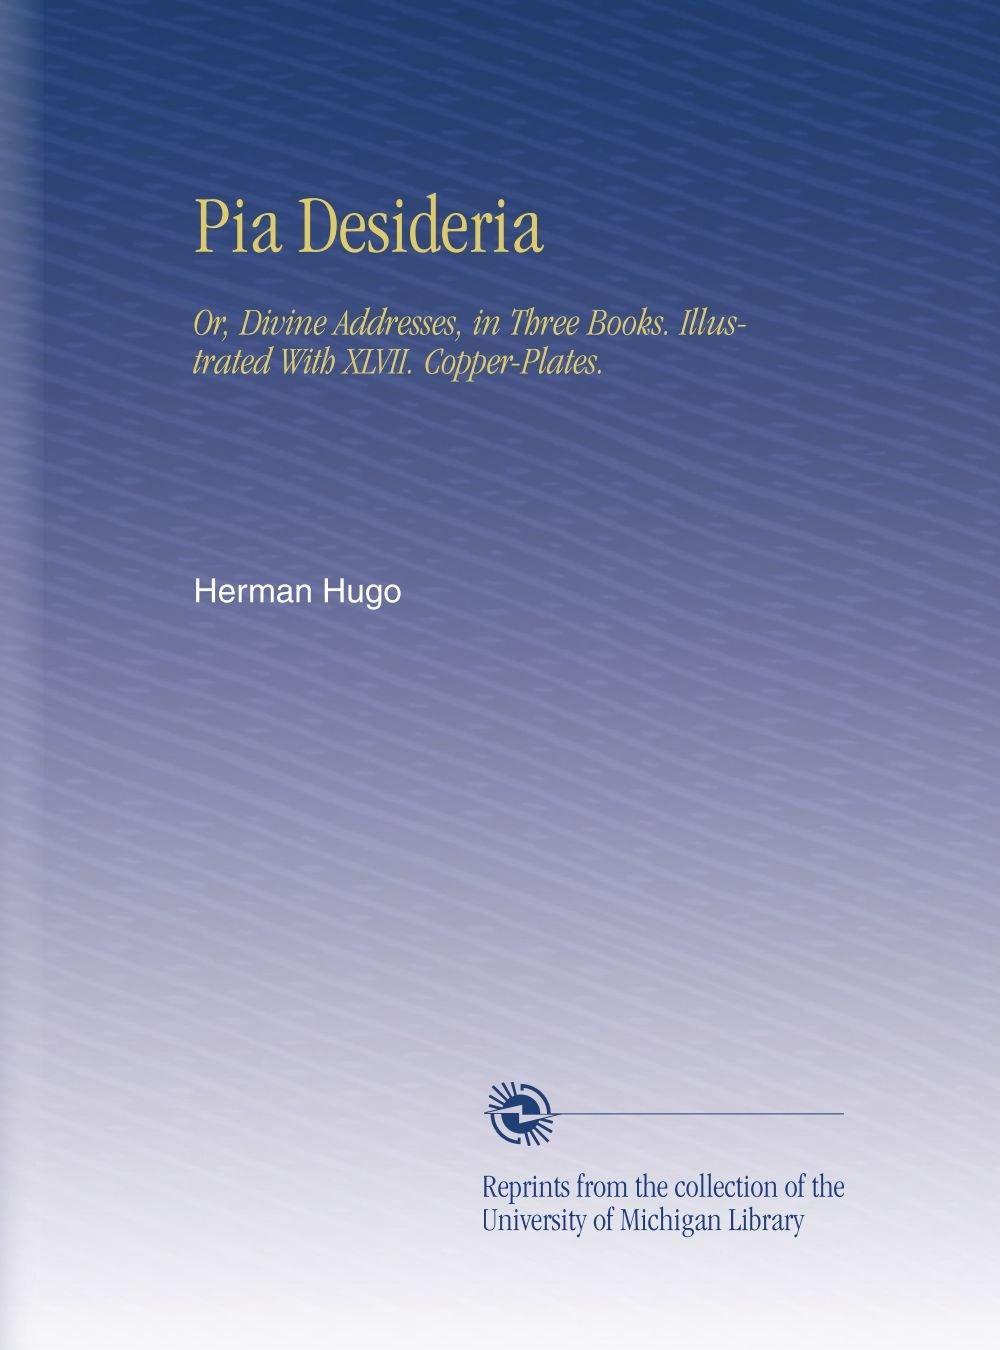 Download Pia Desideria: Or, Divine Addresses, in Three Books. Illustrated With XLVII. Copper-Plates. (Latin Edition) PDF